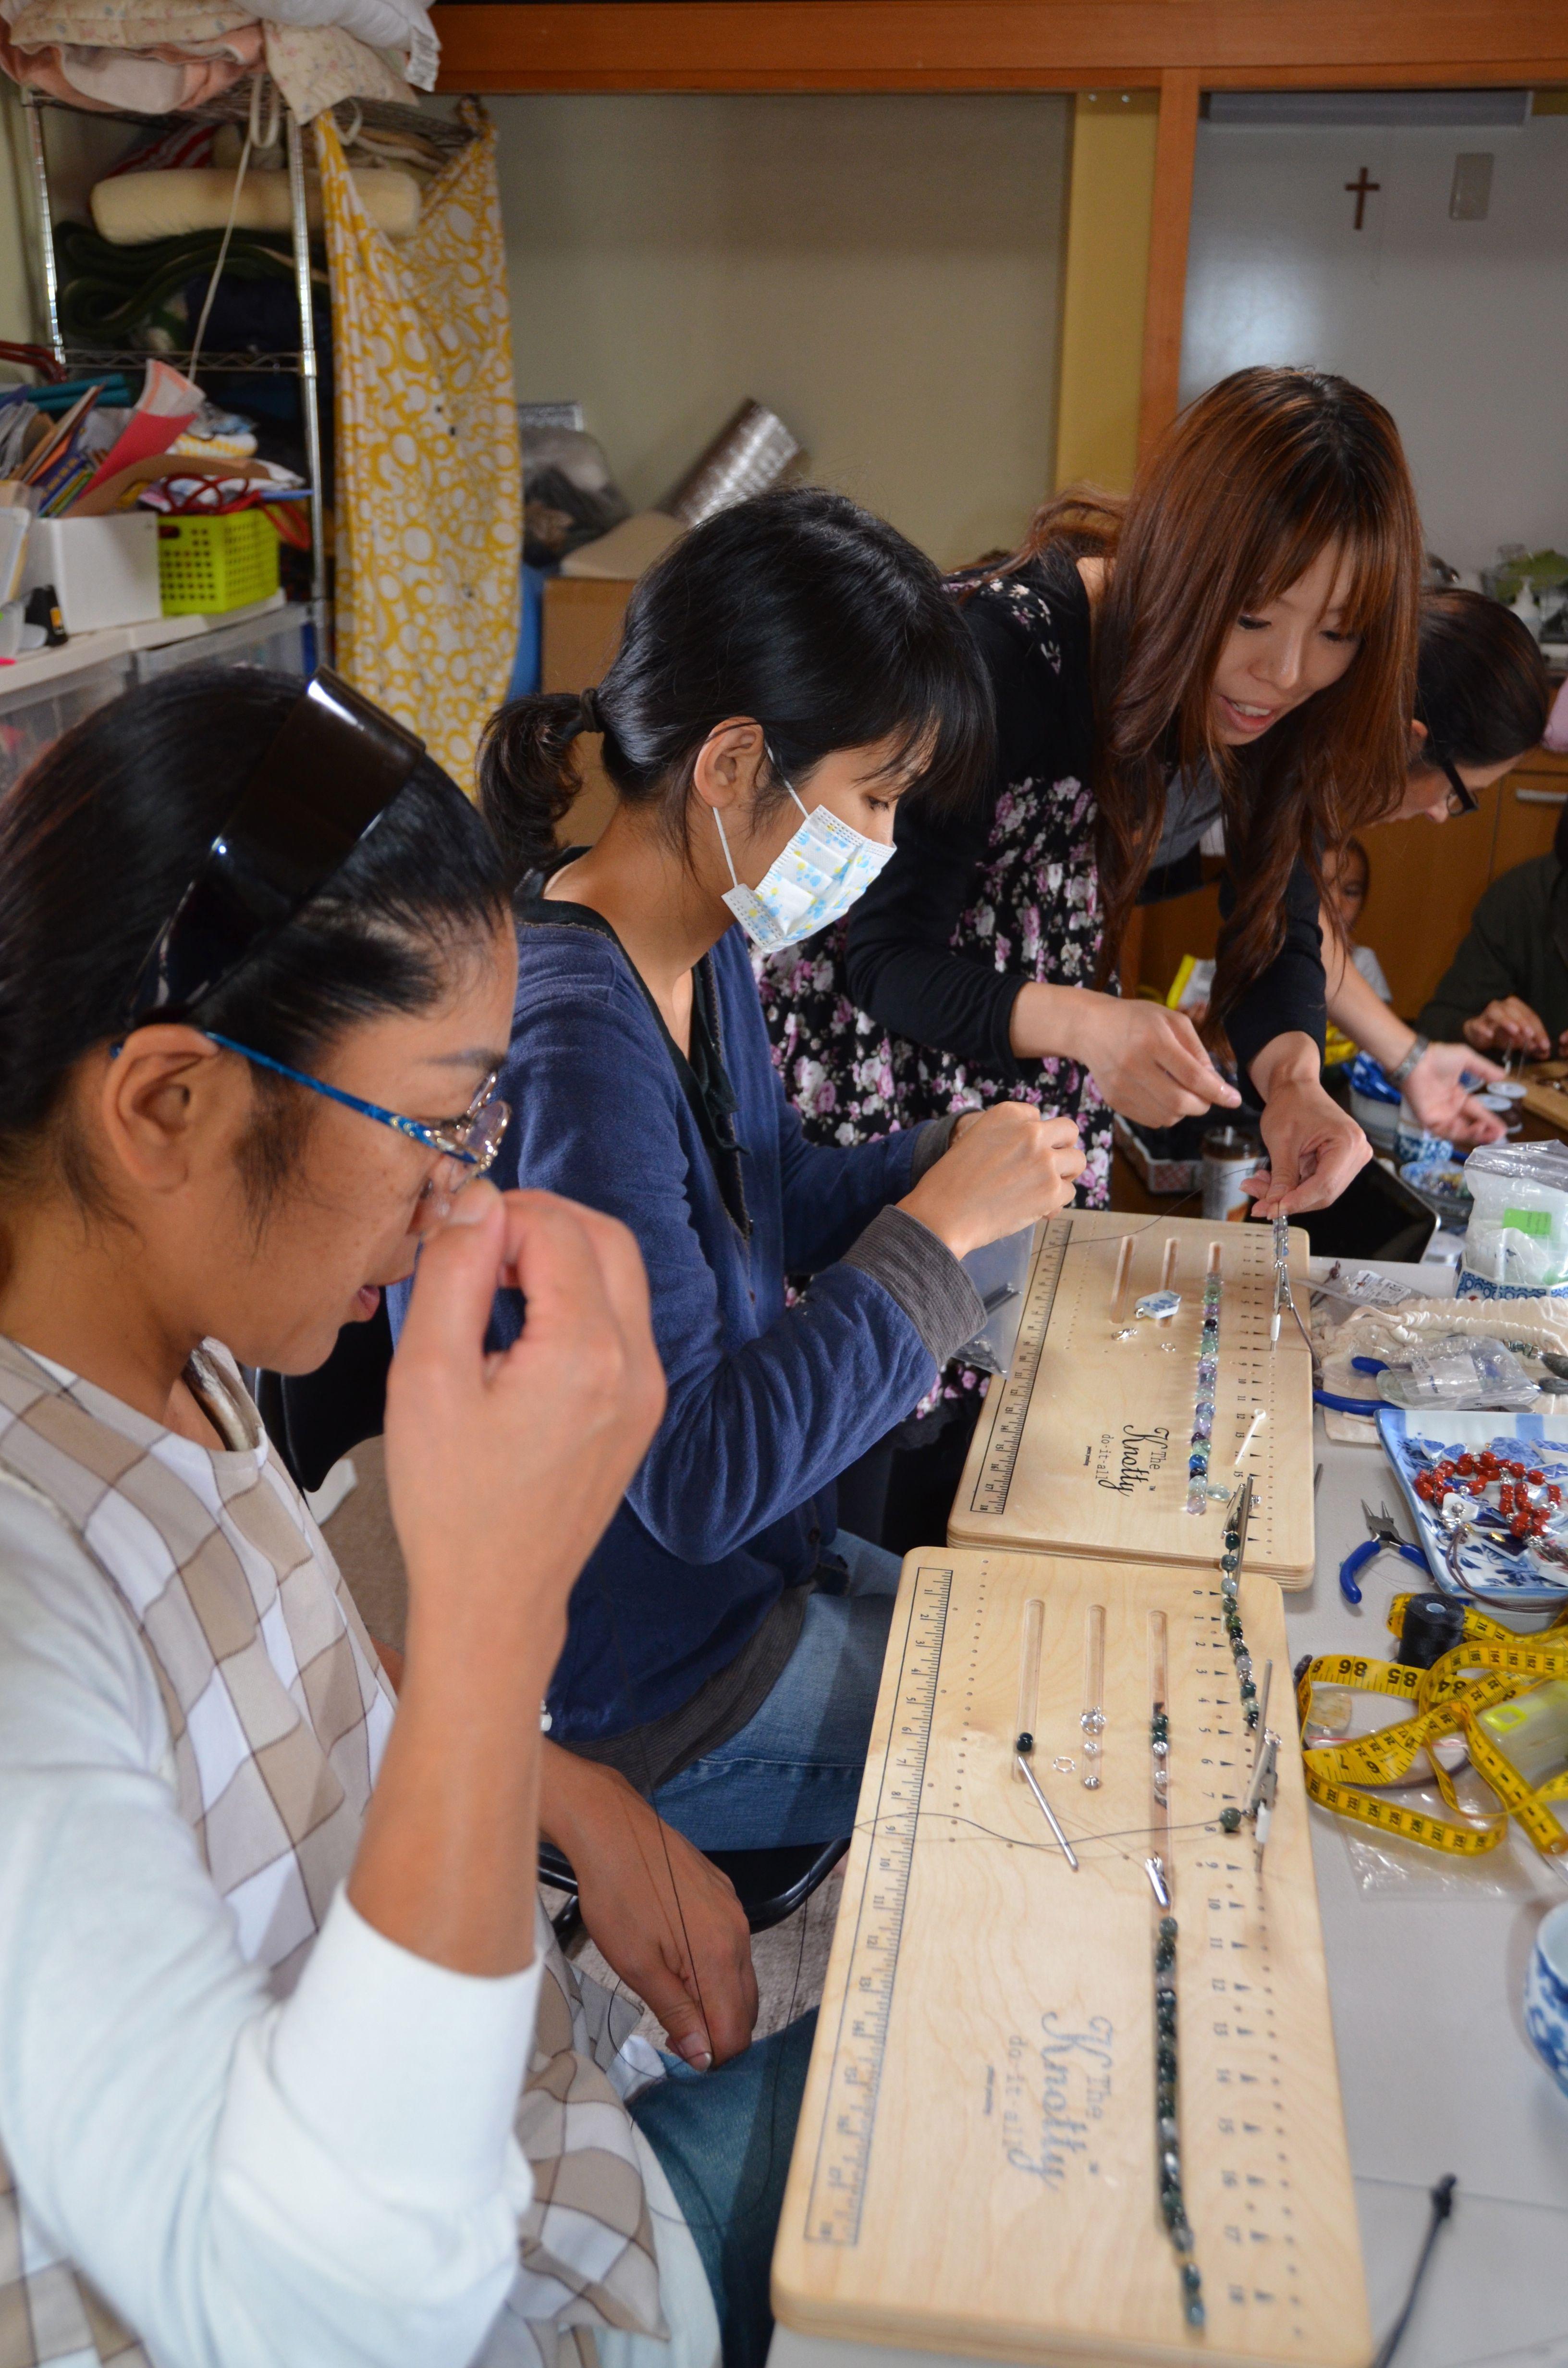 nozomi project Ishinomaki japan women making jewelry for relief